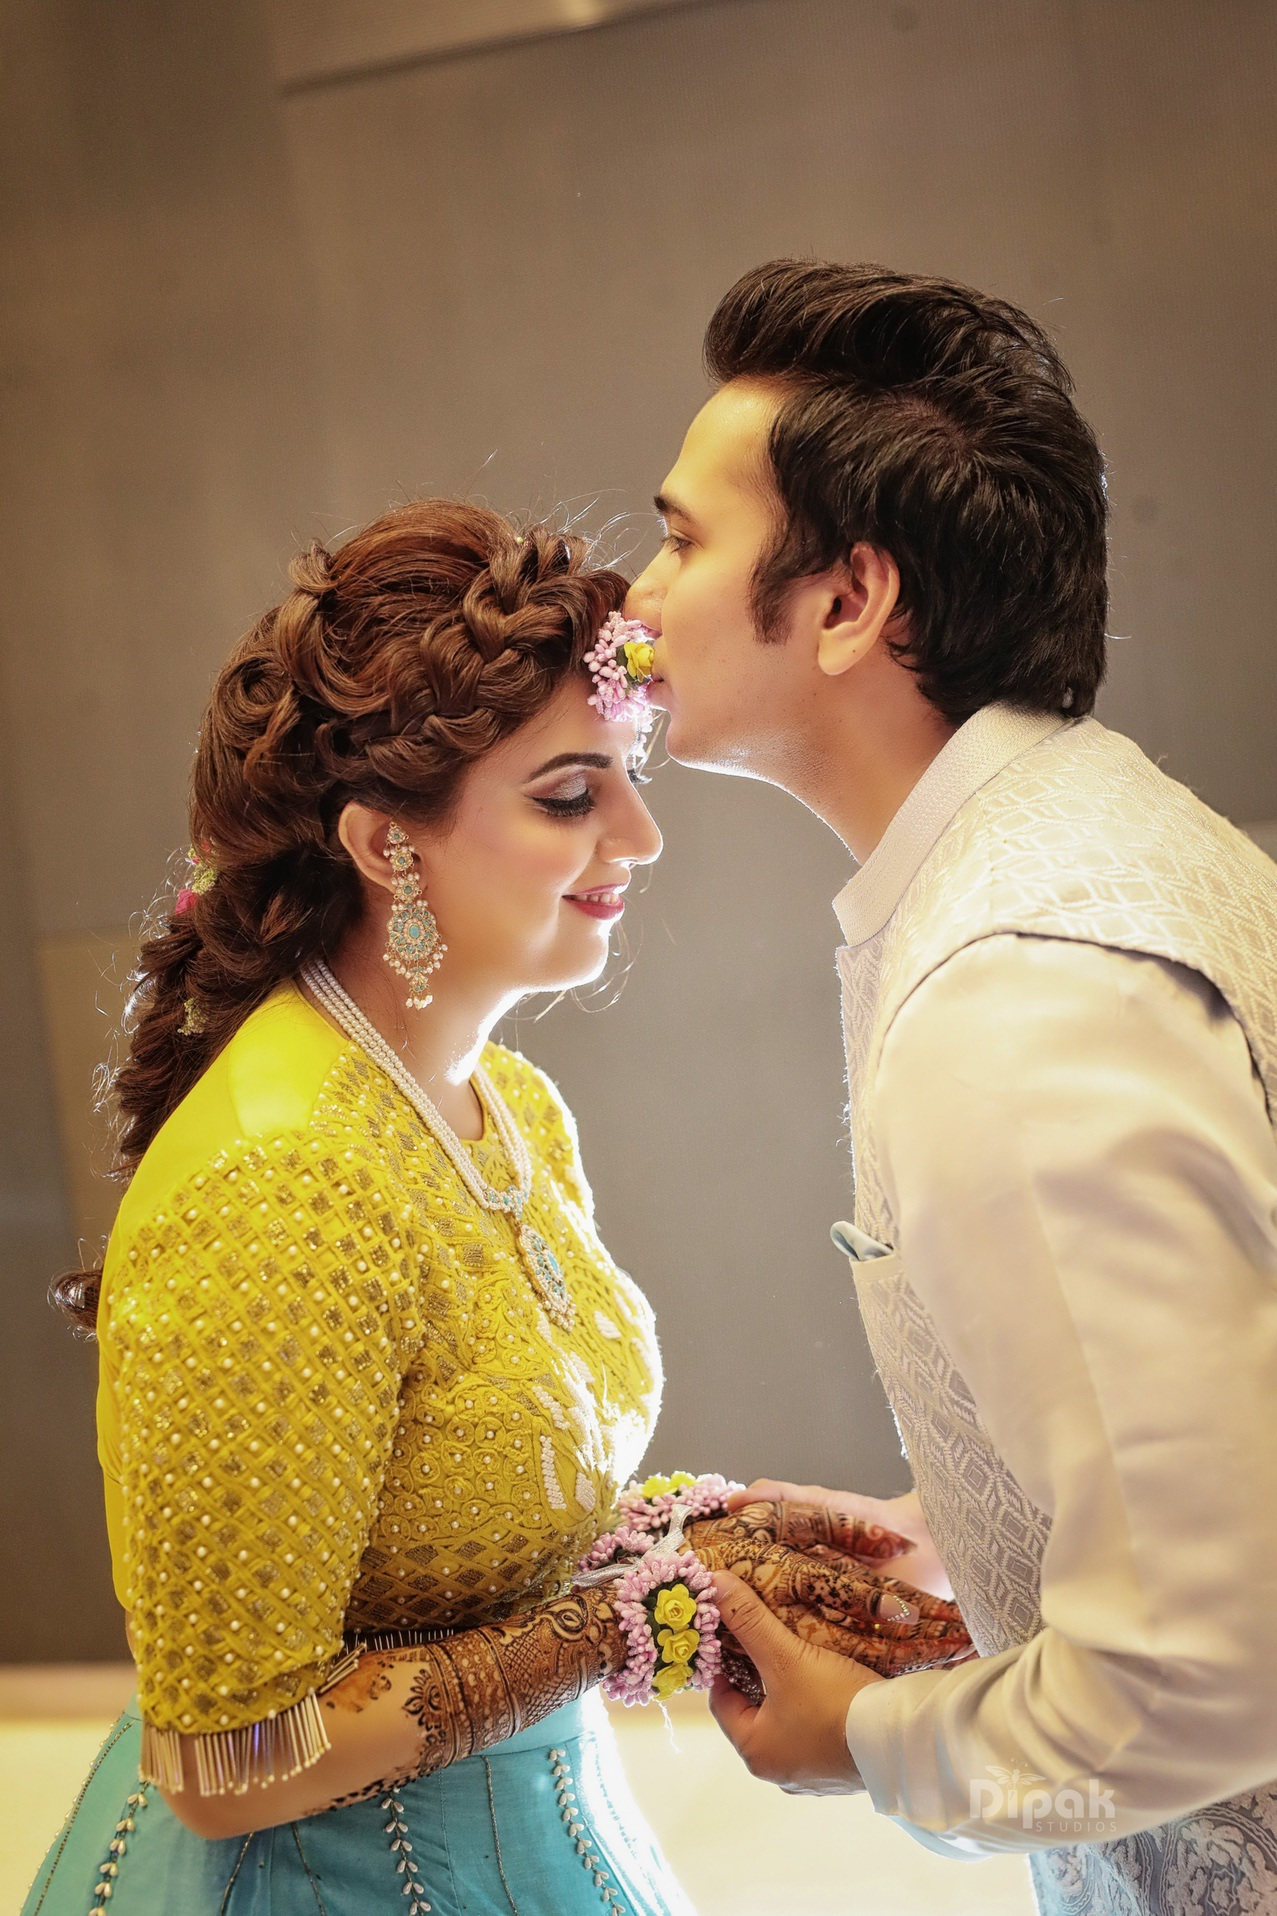 Couples Of Dipak Studios Cute Married Couple Hd 820823 Hd